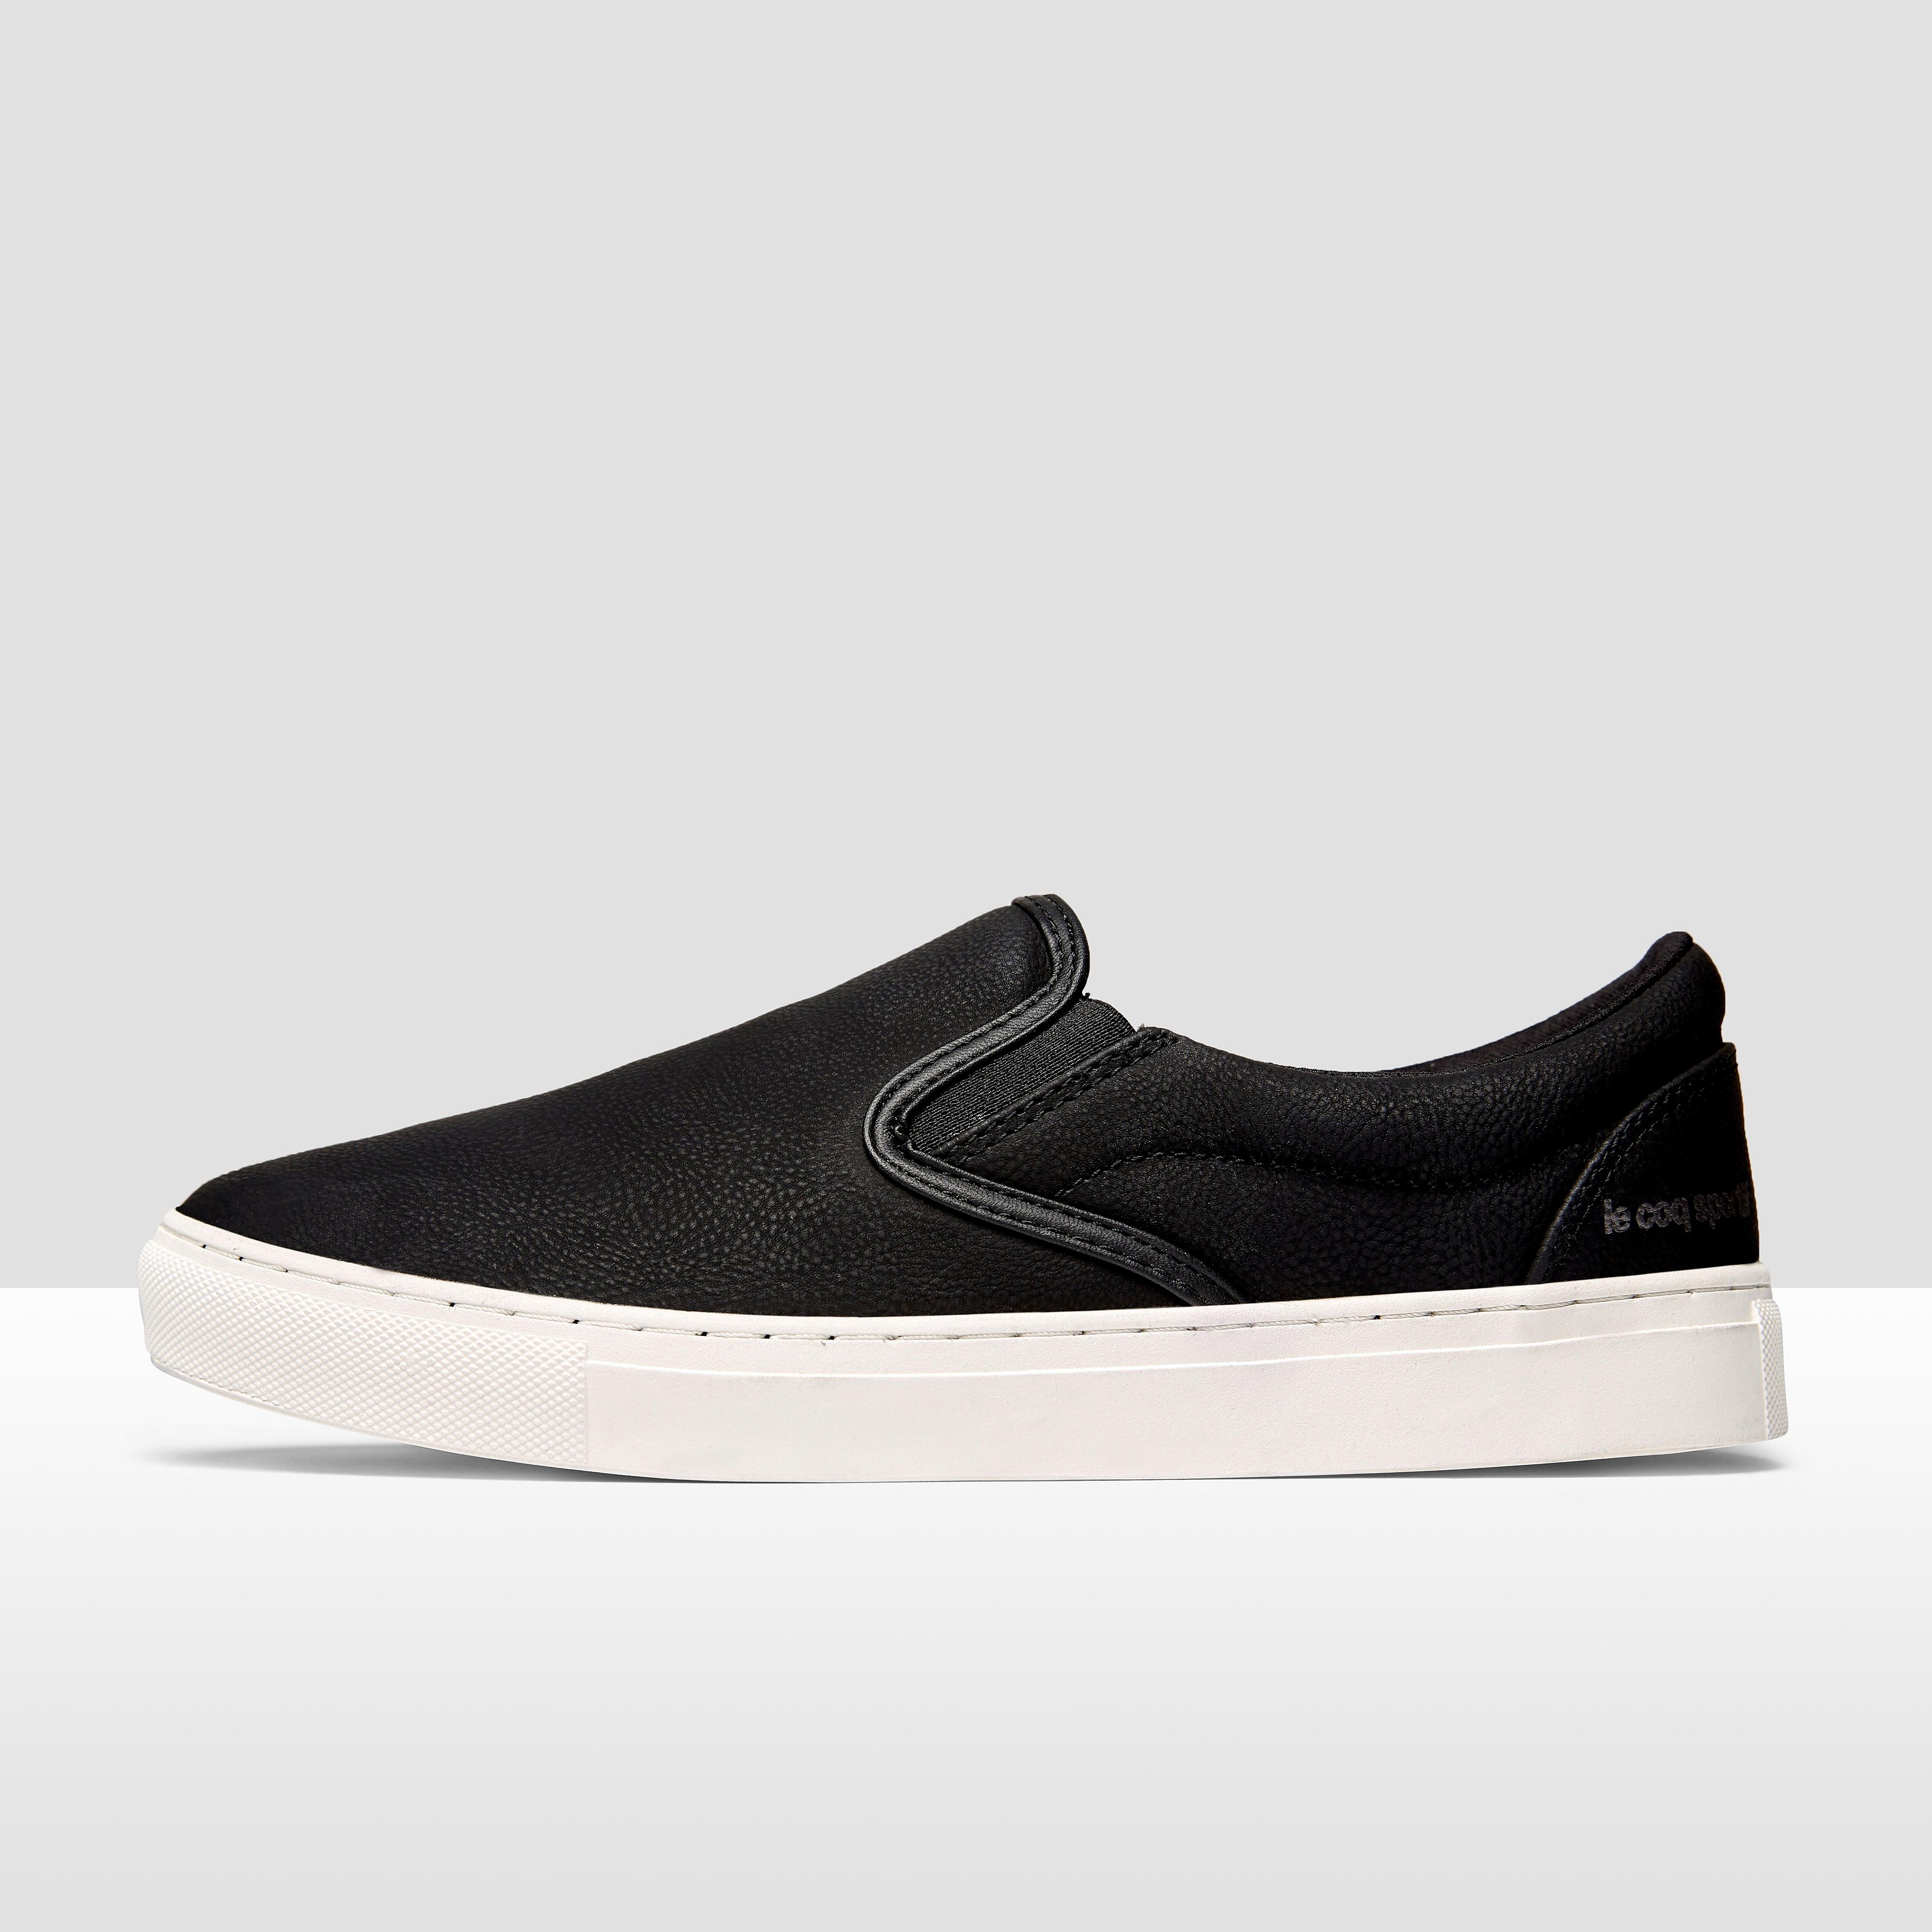 Frou Frou In-Steps Sneakers Zwart Dames - Black thumbnail